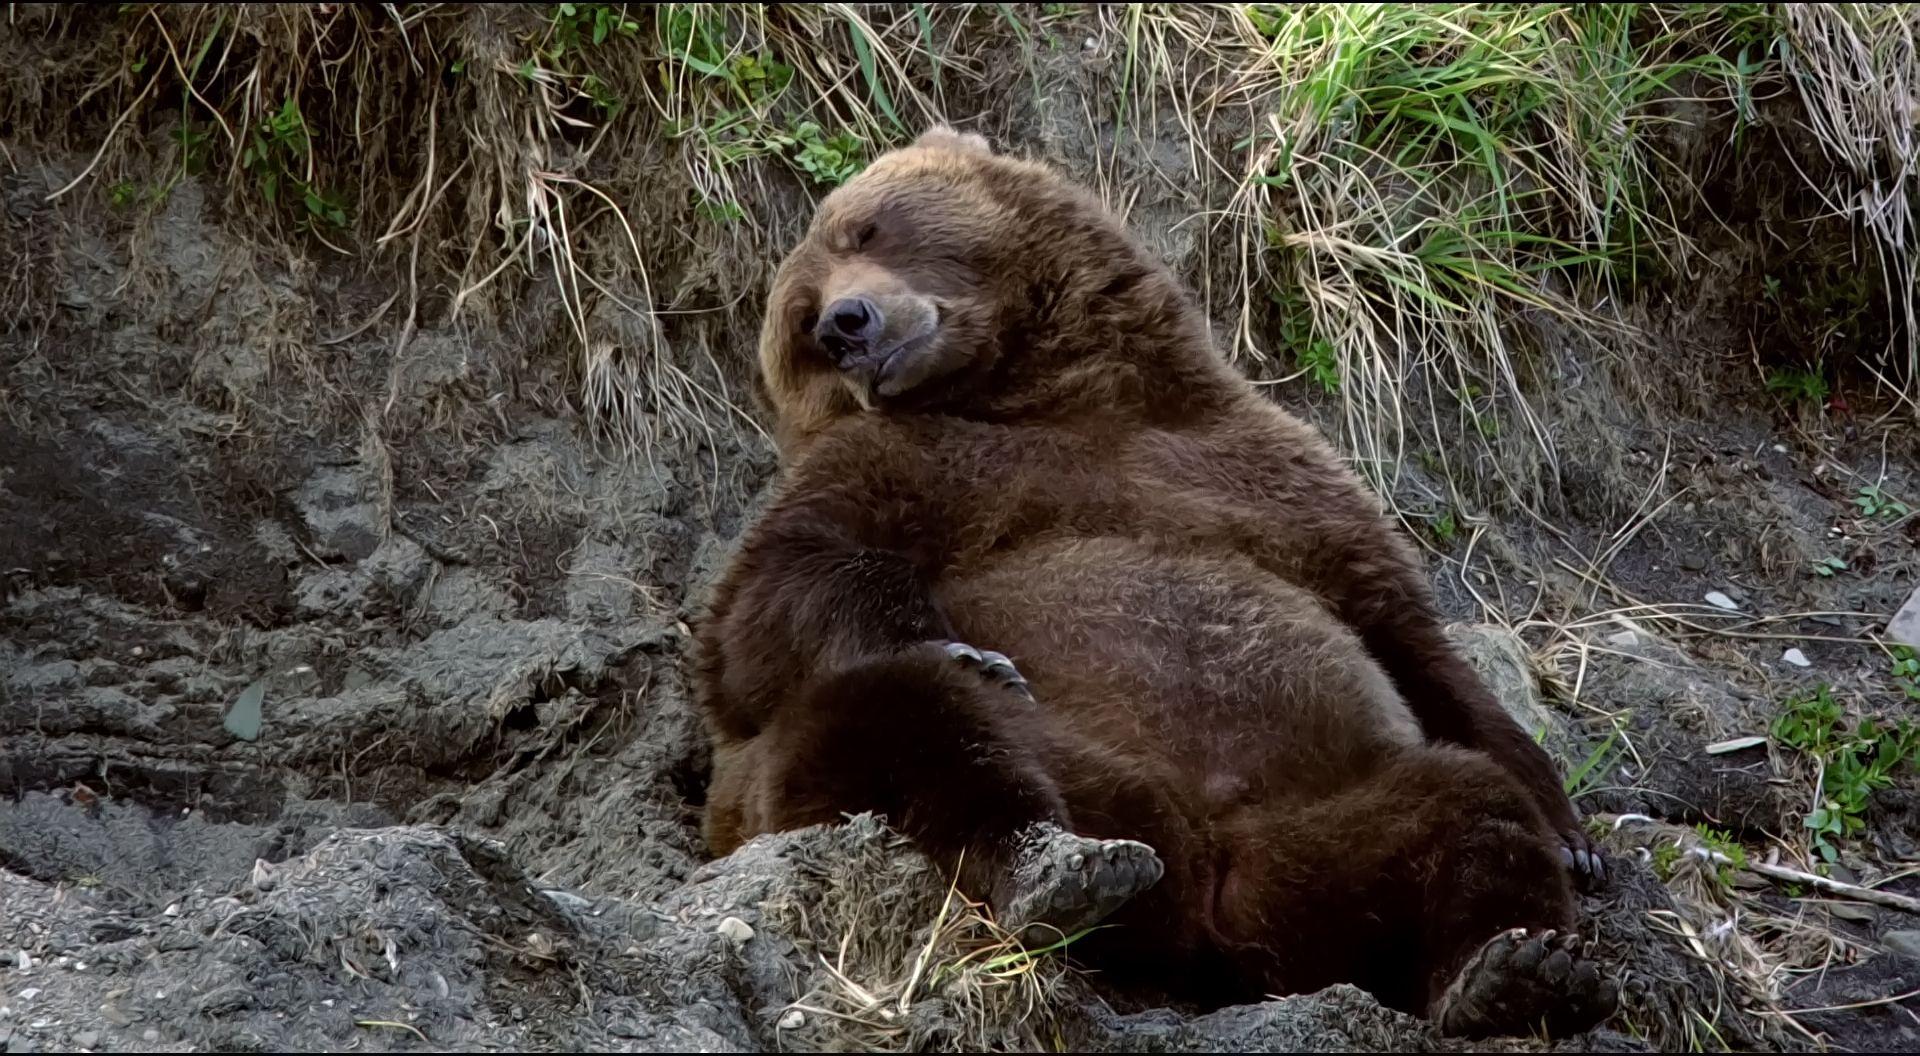 Bear images - Google Search | Bears | Pinterest | Bears